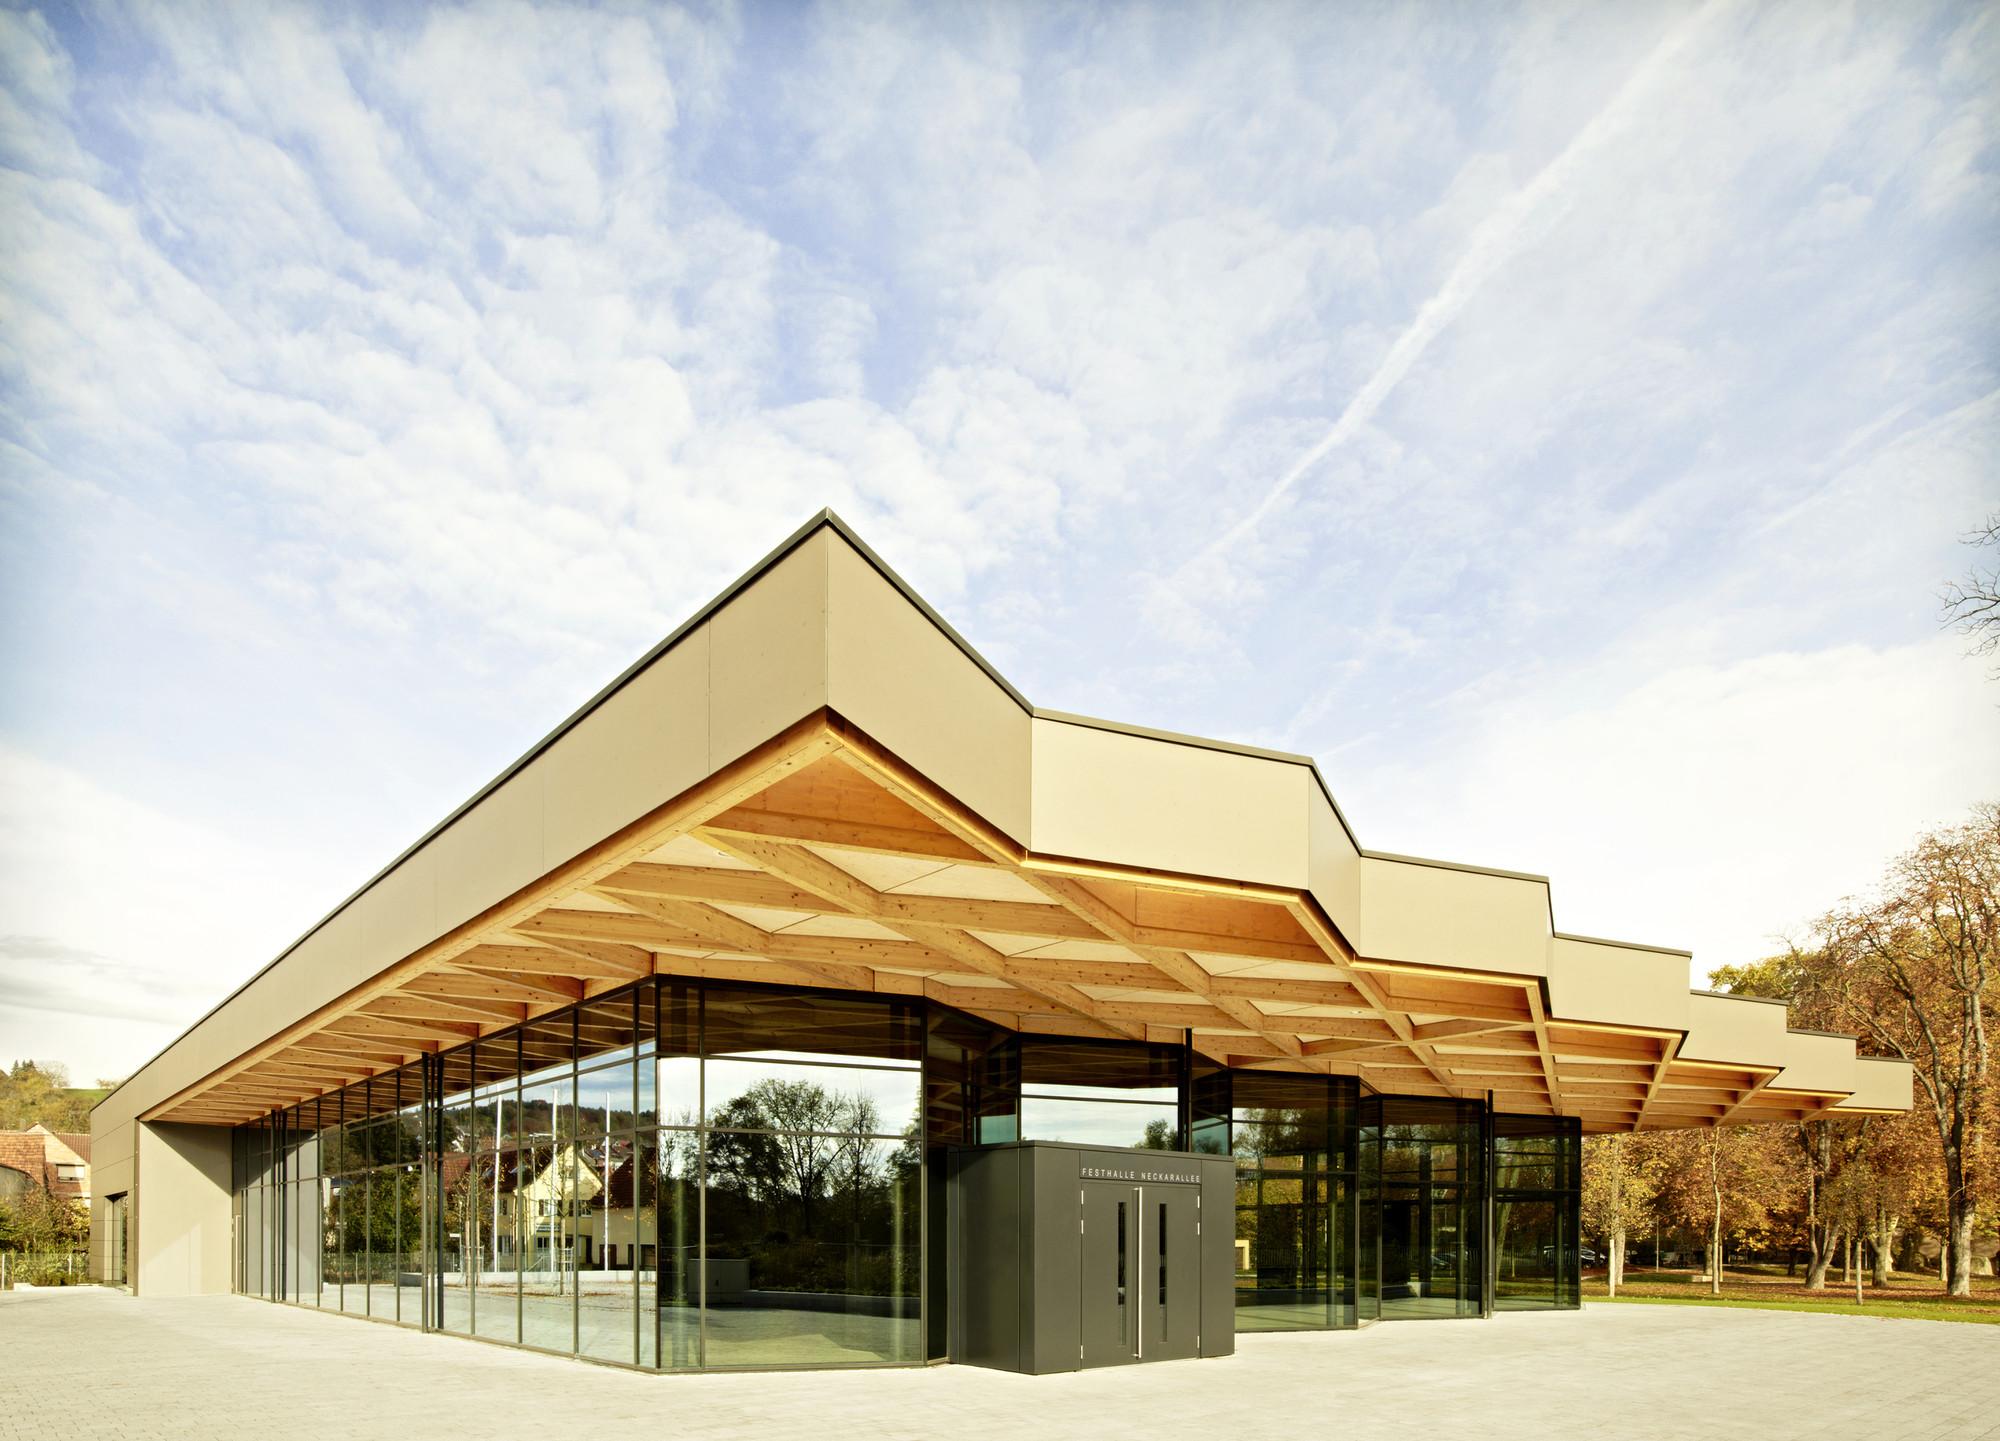 Festival Hall 'Neckarallee' in Neckartailfingen  / Ackermann+Raff, © Thomas Herrmann